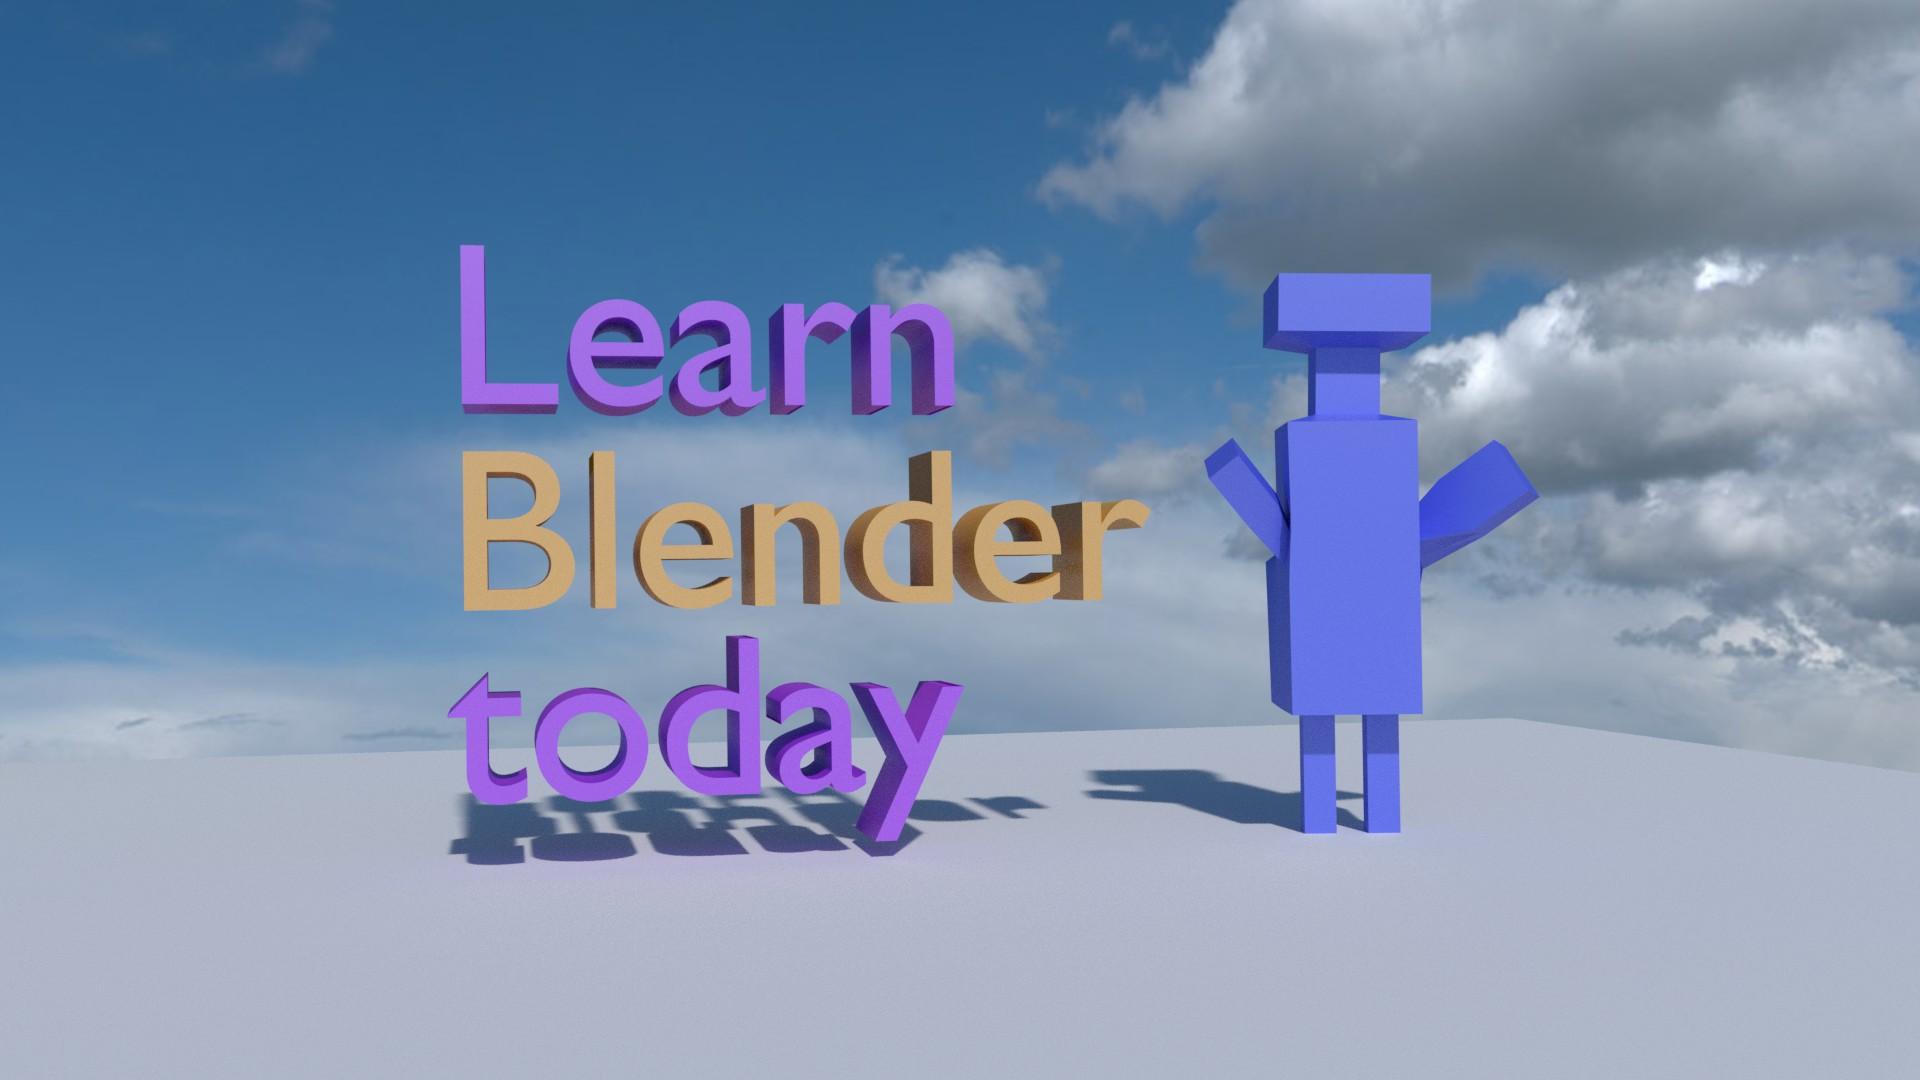 Blender_Render Thumbnail_______donie0001